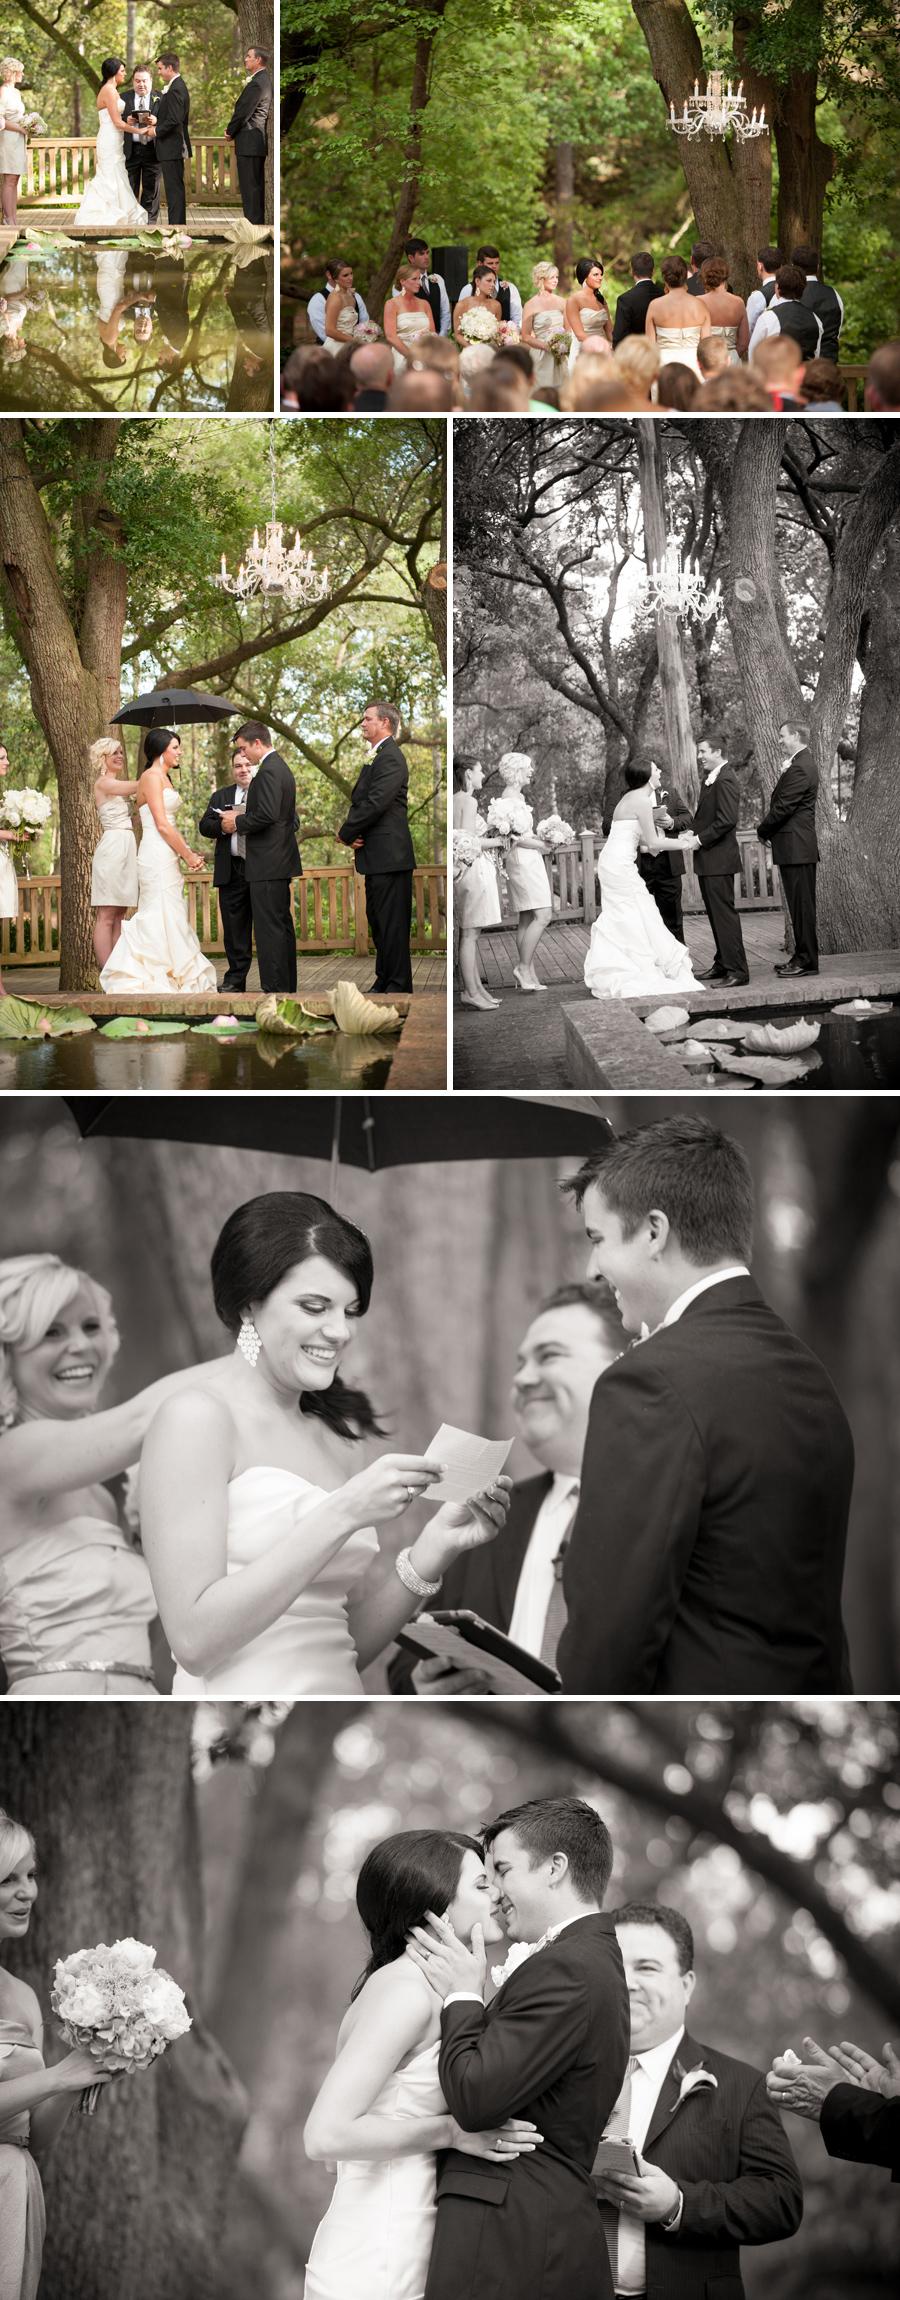 Madison and Charles Wedding at Hopeland Gardens